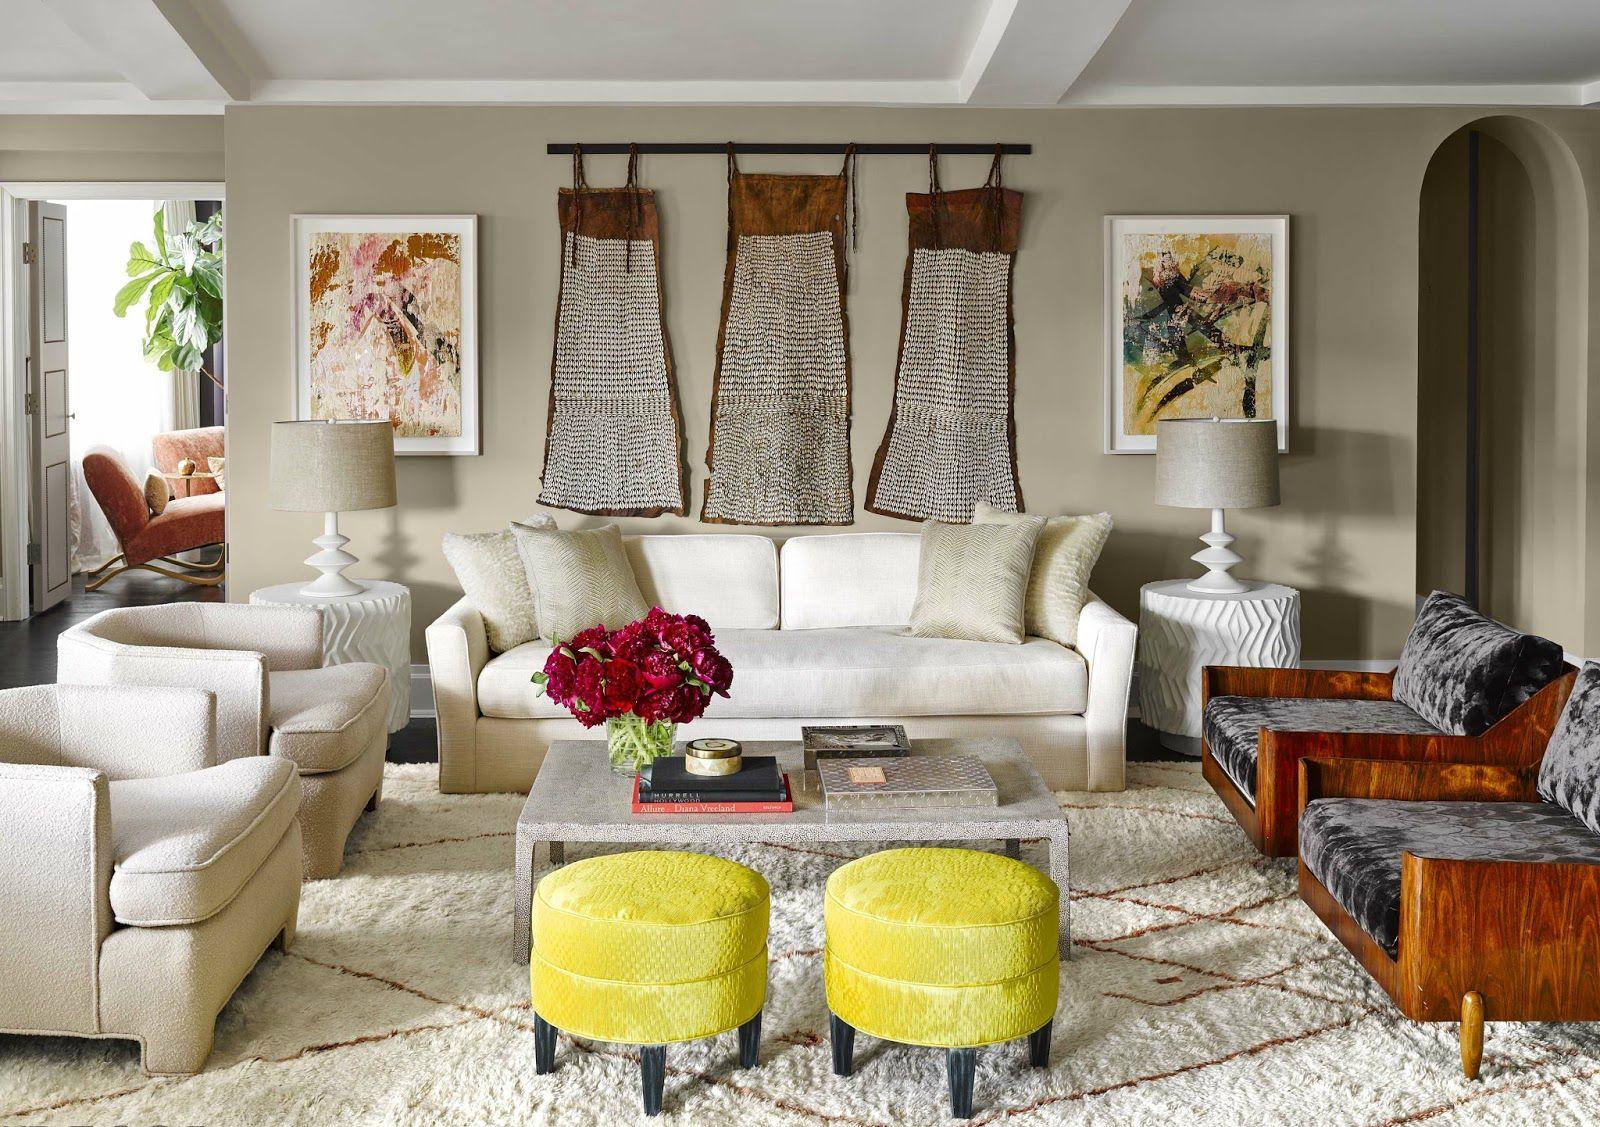 Elle Decor Color Trends 2017 Living Room Neutral Tones